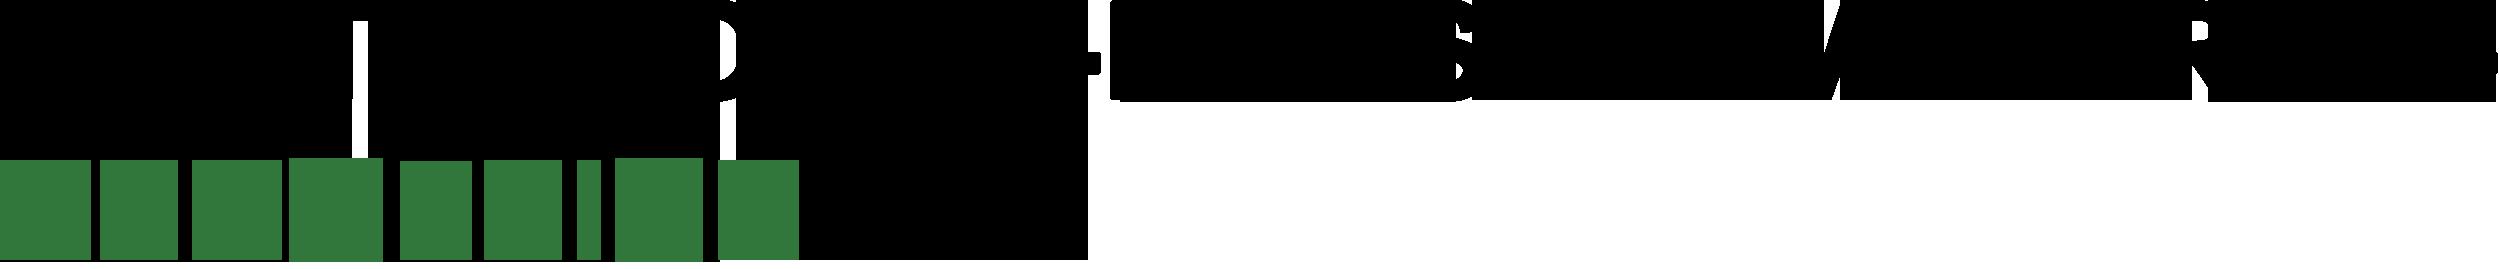 bausparvertrag vergleich logo